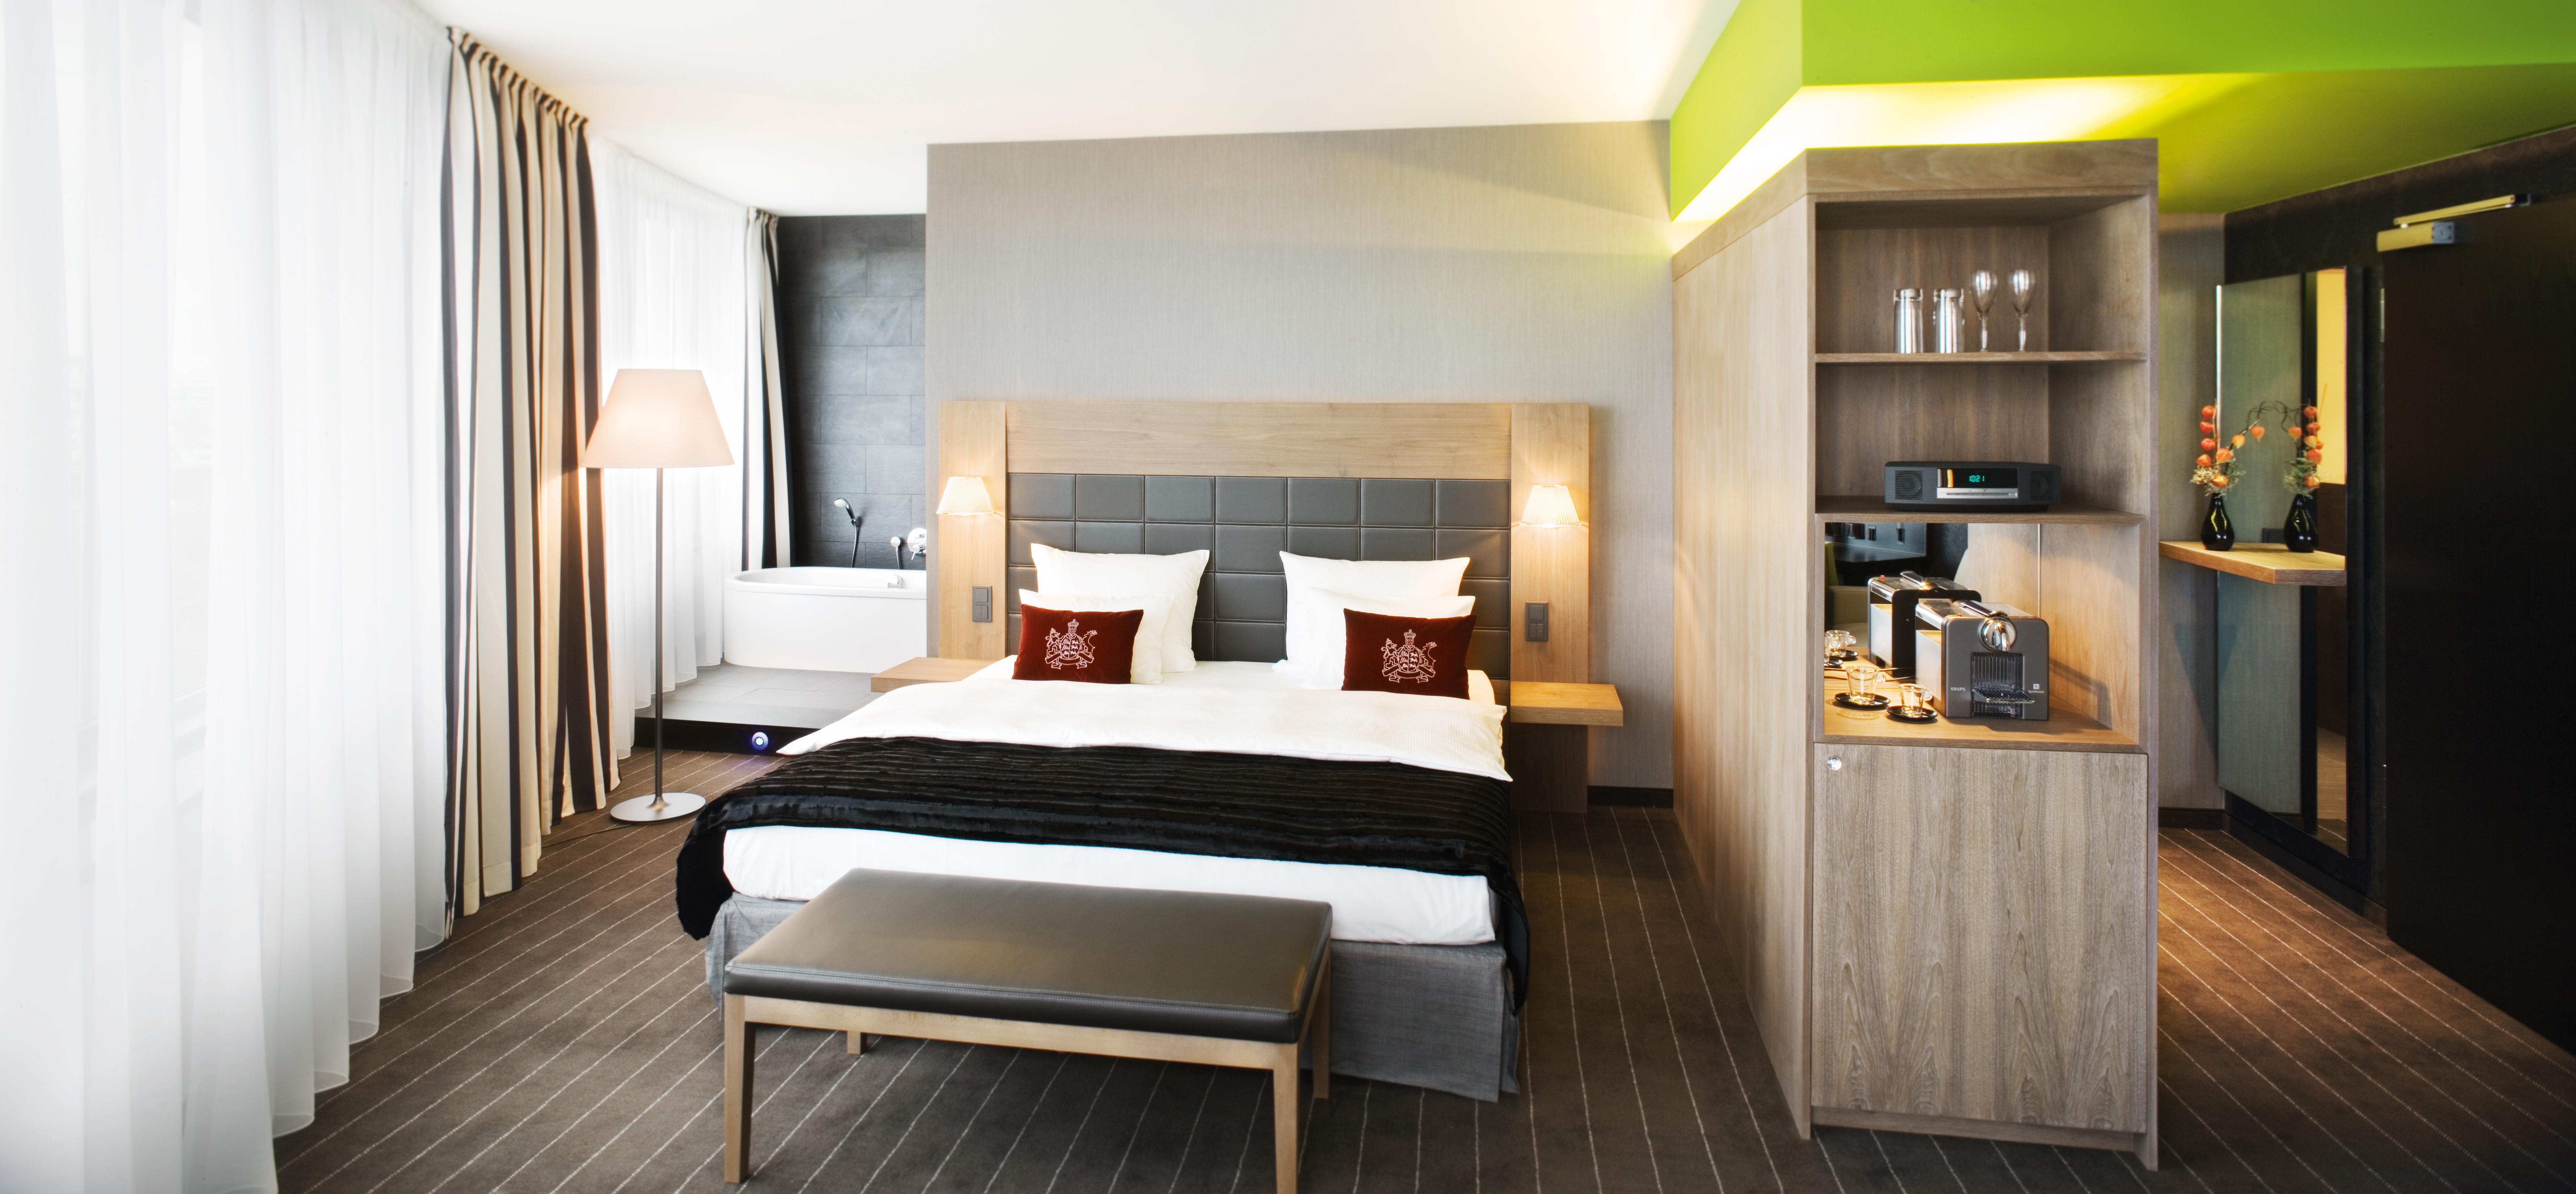 interior stuttgart edimaps. Black Bedroom Furniture Sets. Home Design Ideas